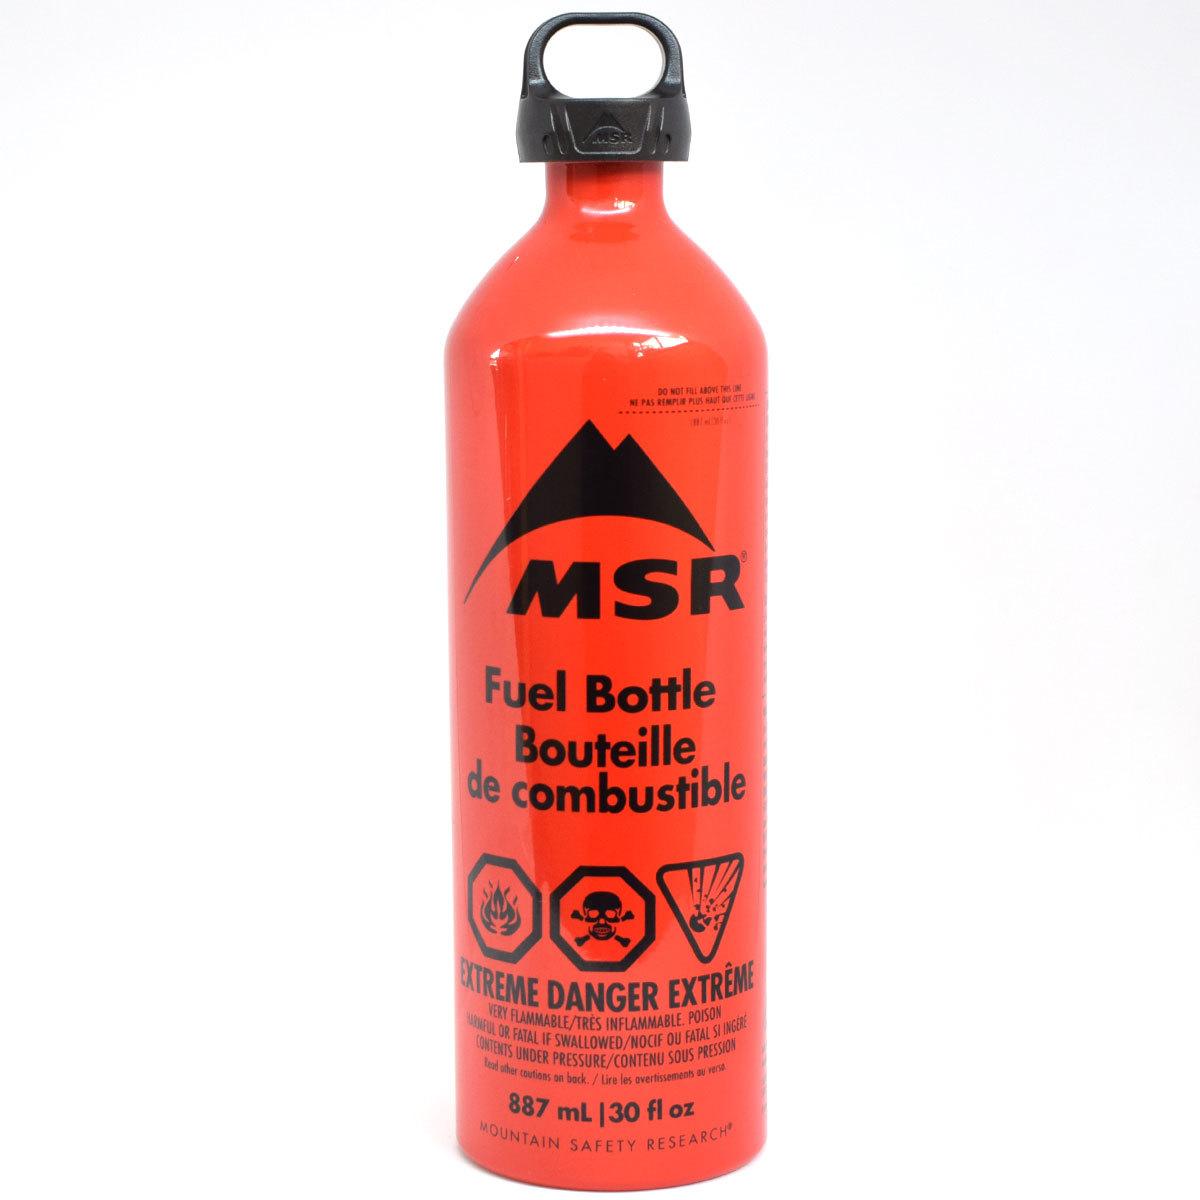 MSR FUEL BOTTLES 燃料ボトル 30oz(887ml)